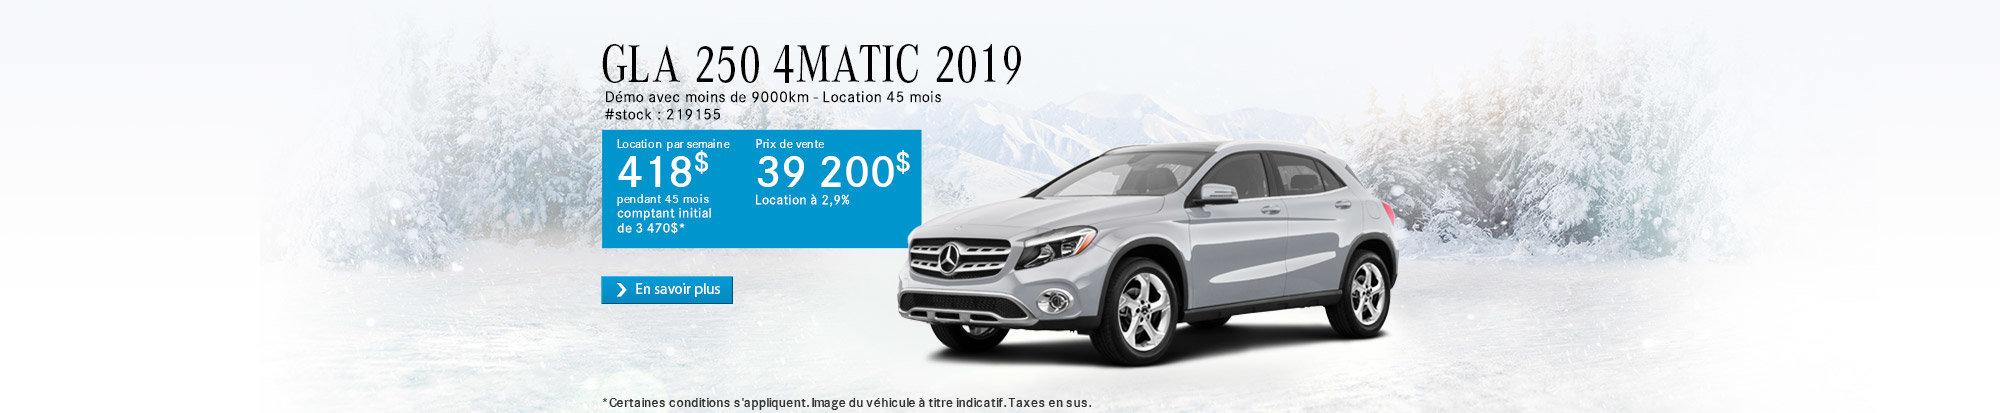 Solde de démos - GLA 250 4MATIC 2019 - header